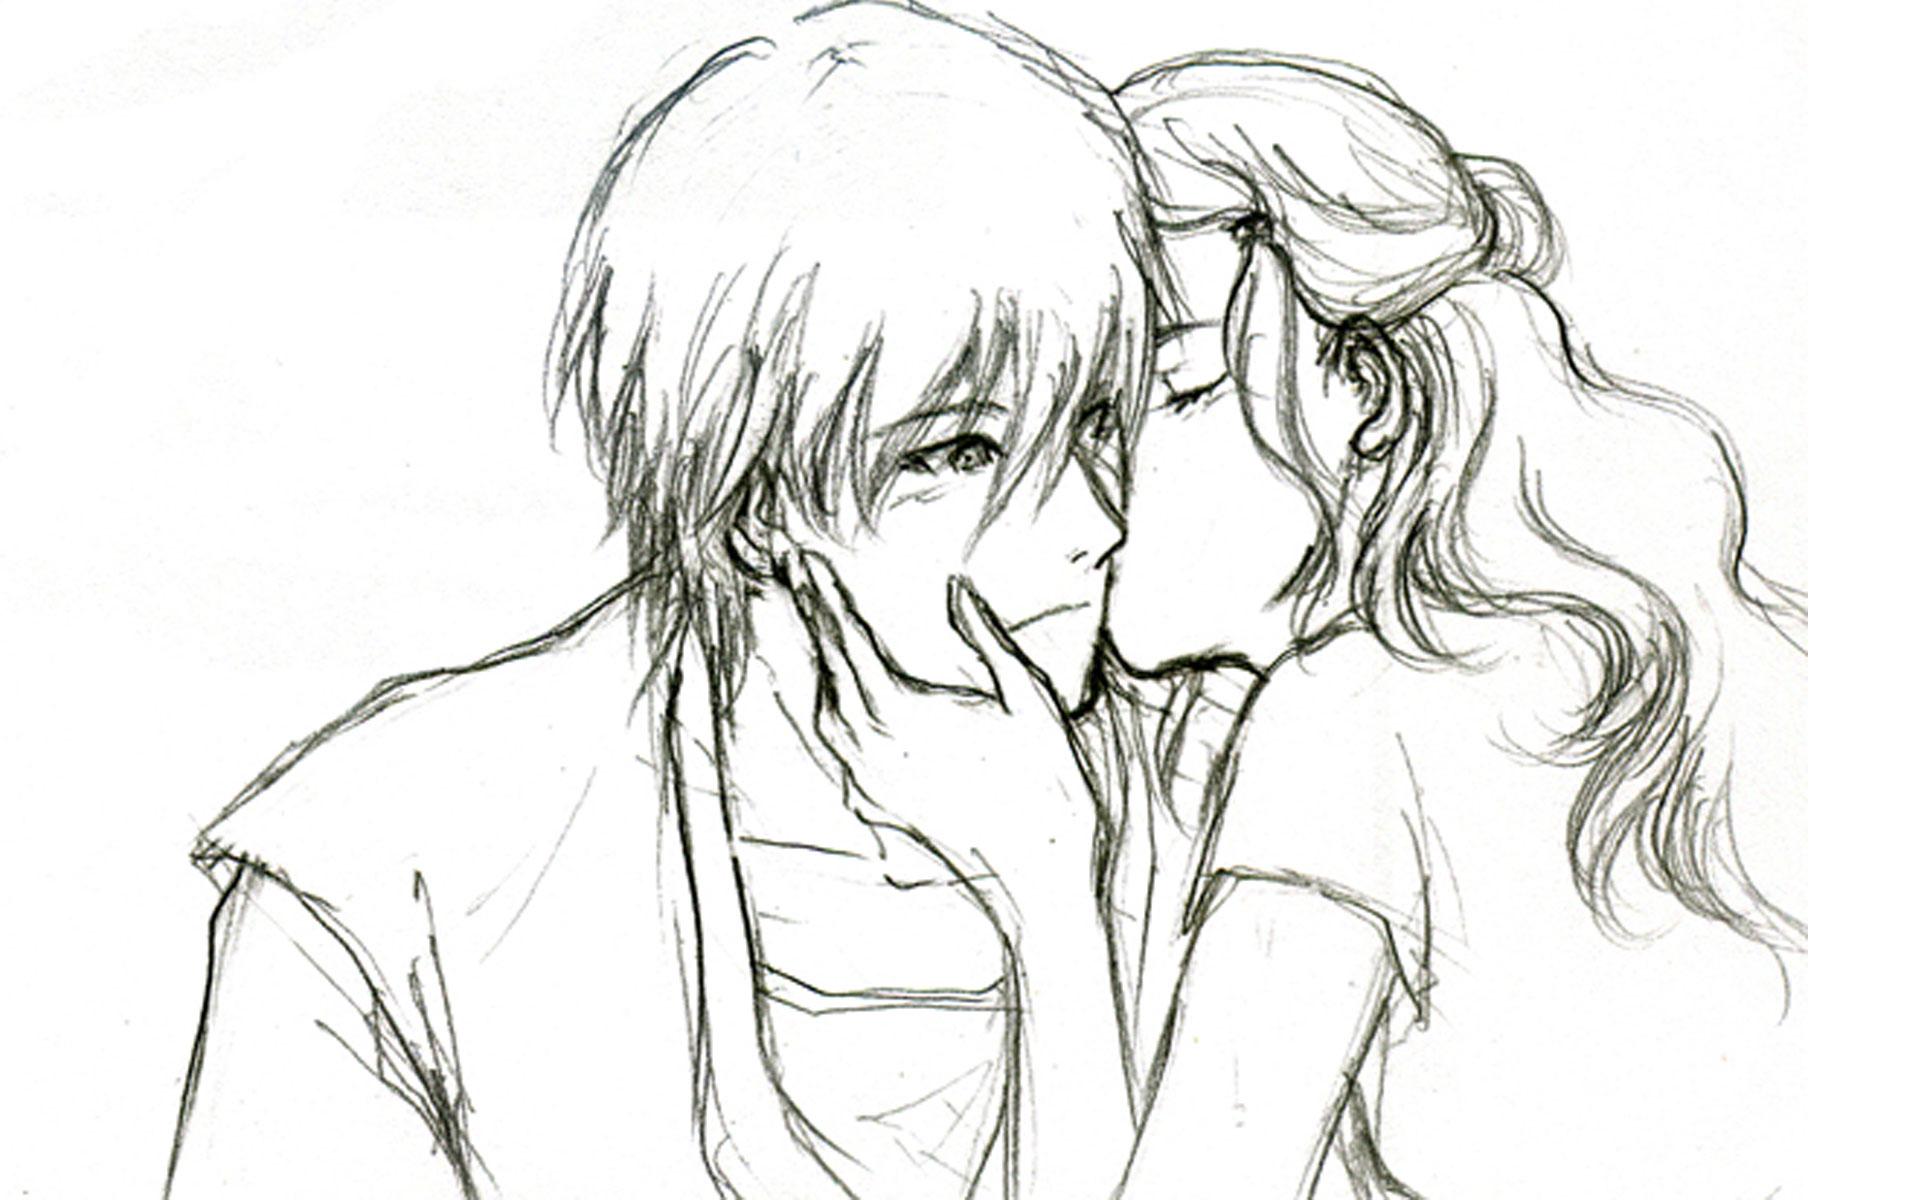 1920x1200 Love Sad Cute Cartoon Boy Drawing Pencil Photo Images